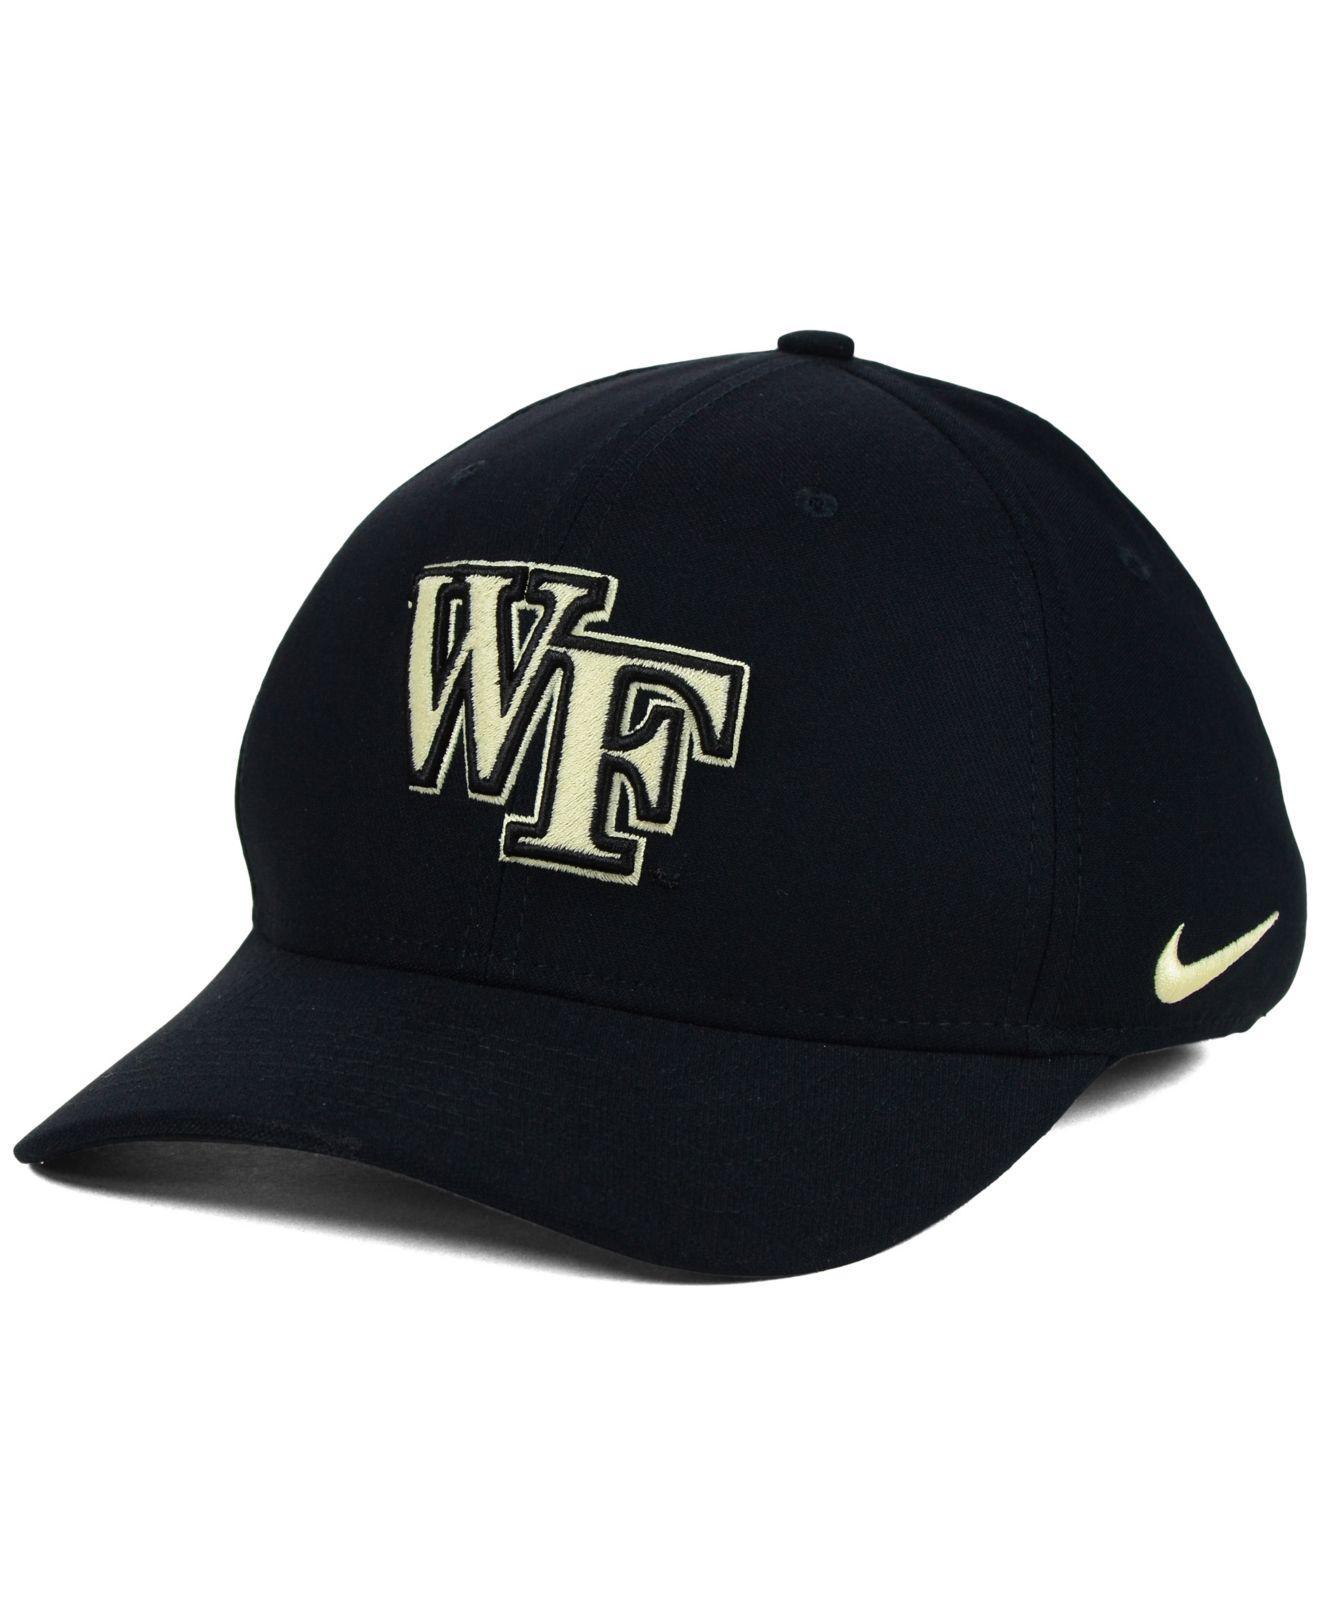 42b622c6f5a Nike - Black Wake Forest Demon Deacons Classic Swoosh Cap for Men - Lyst.  View fullscreen